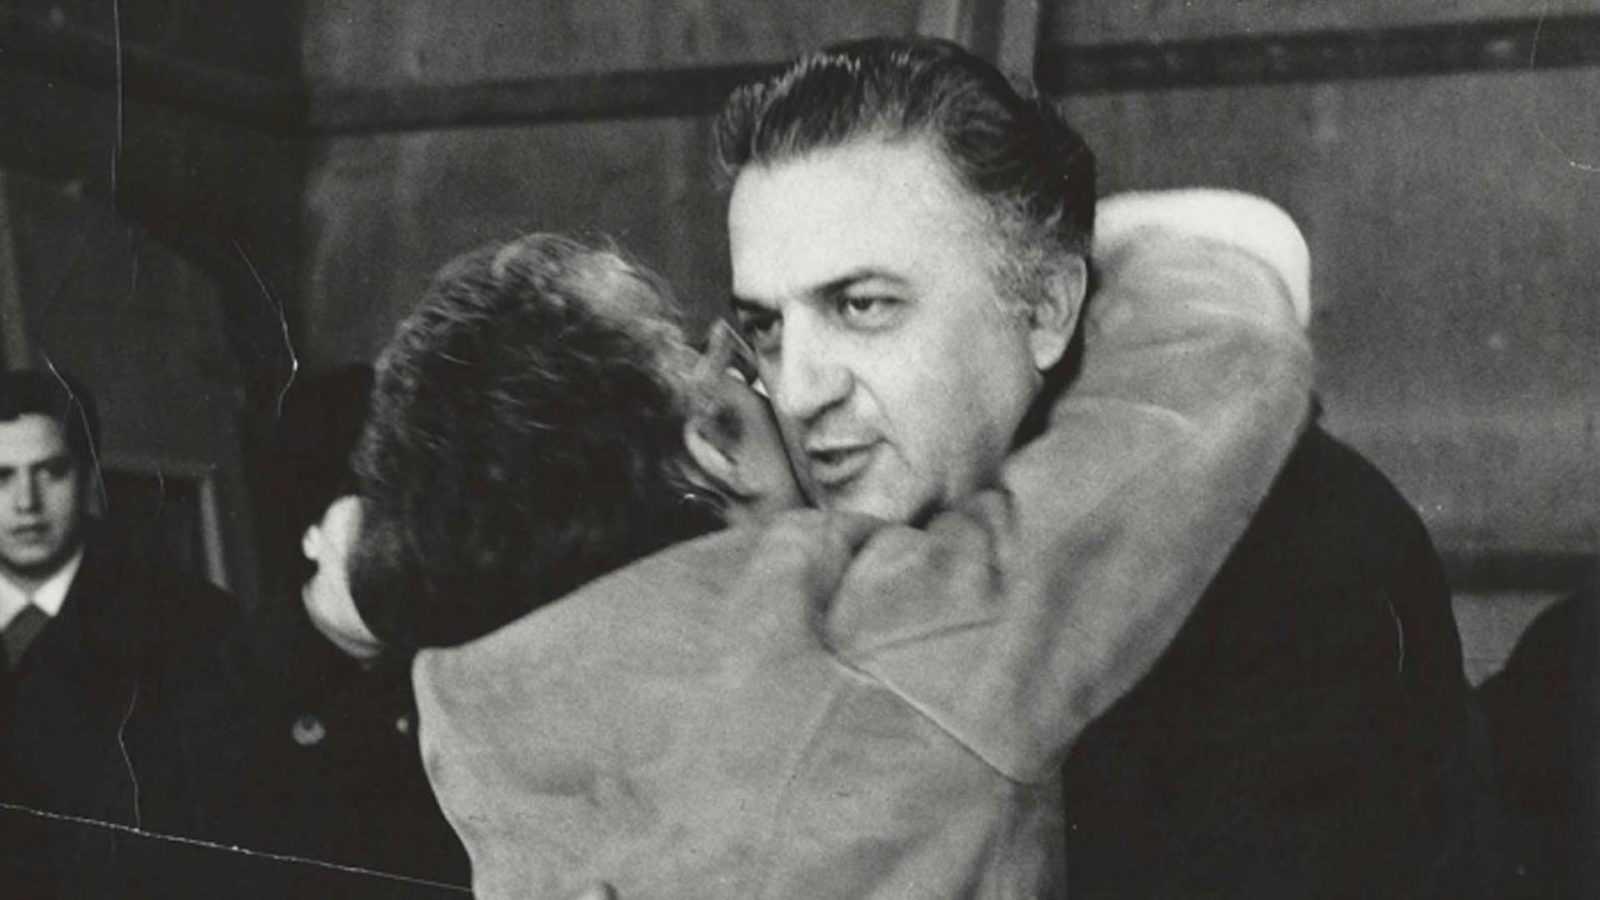 Federico Fellini e Lina Wertmuller abbracciati